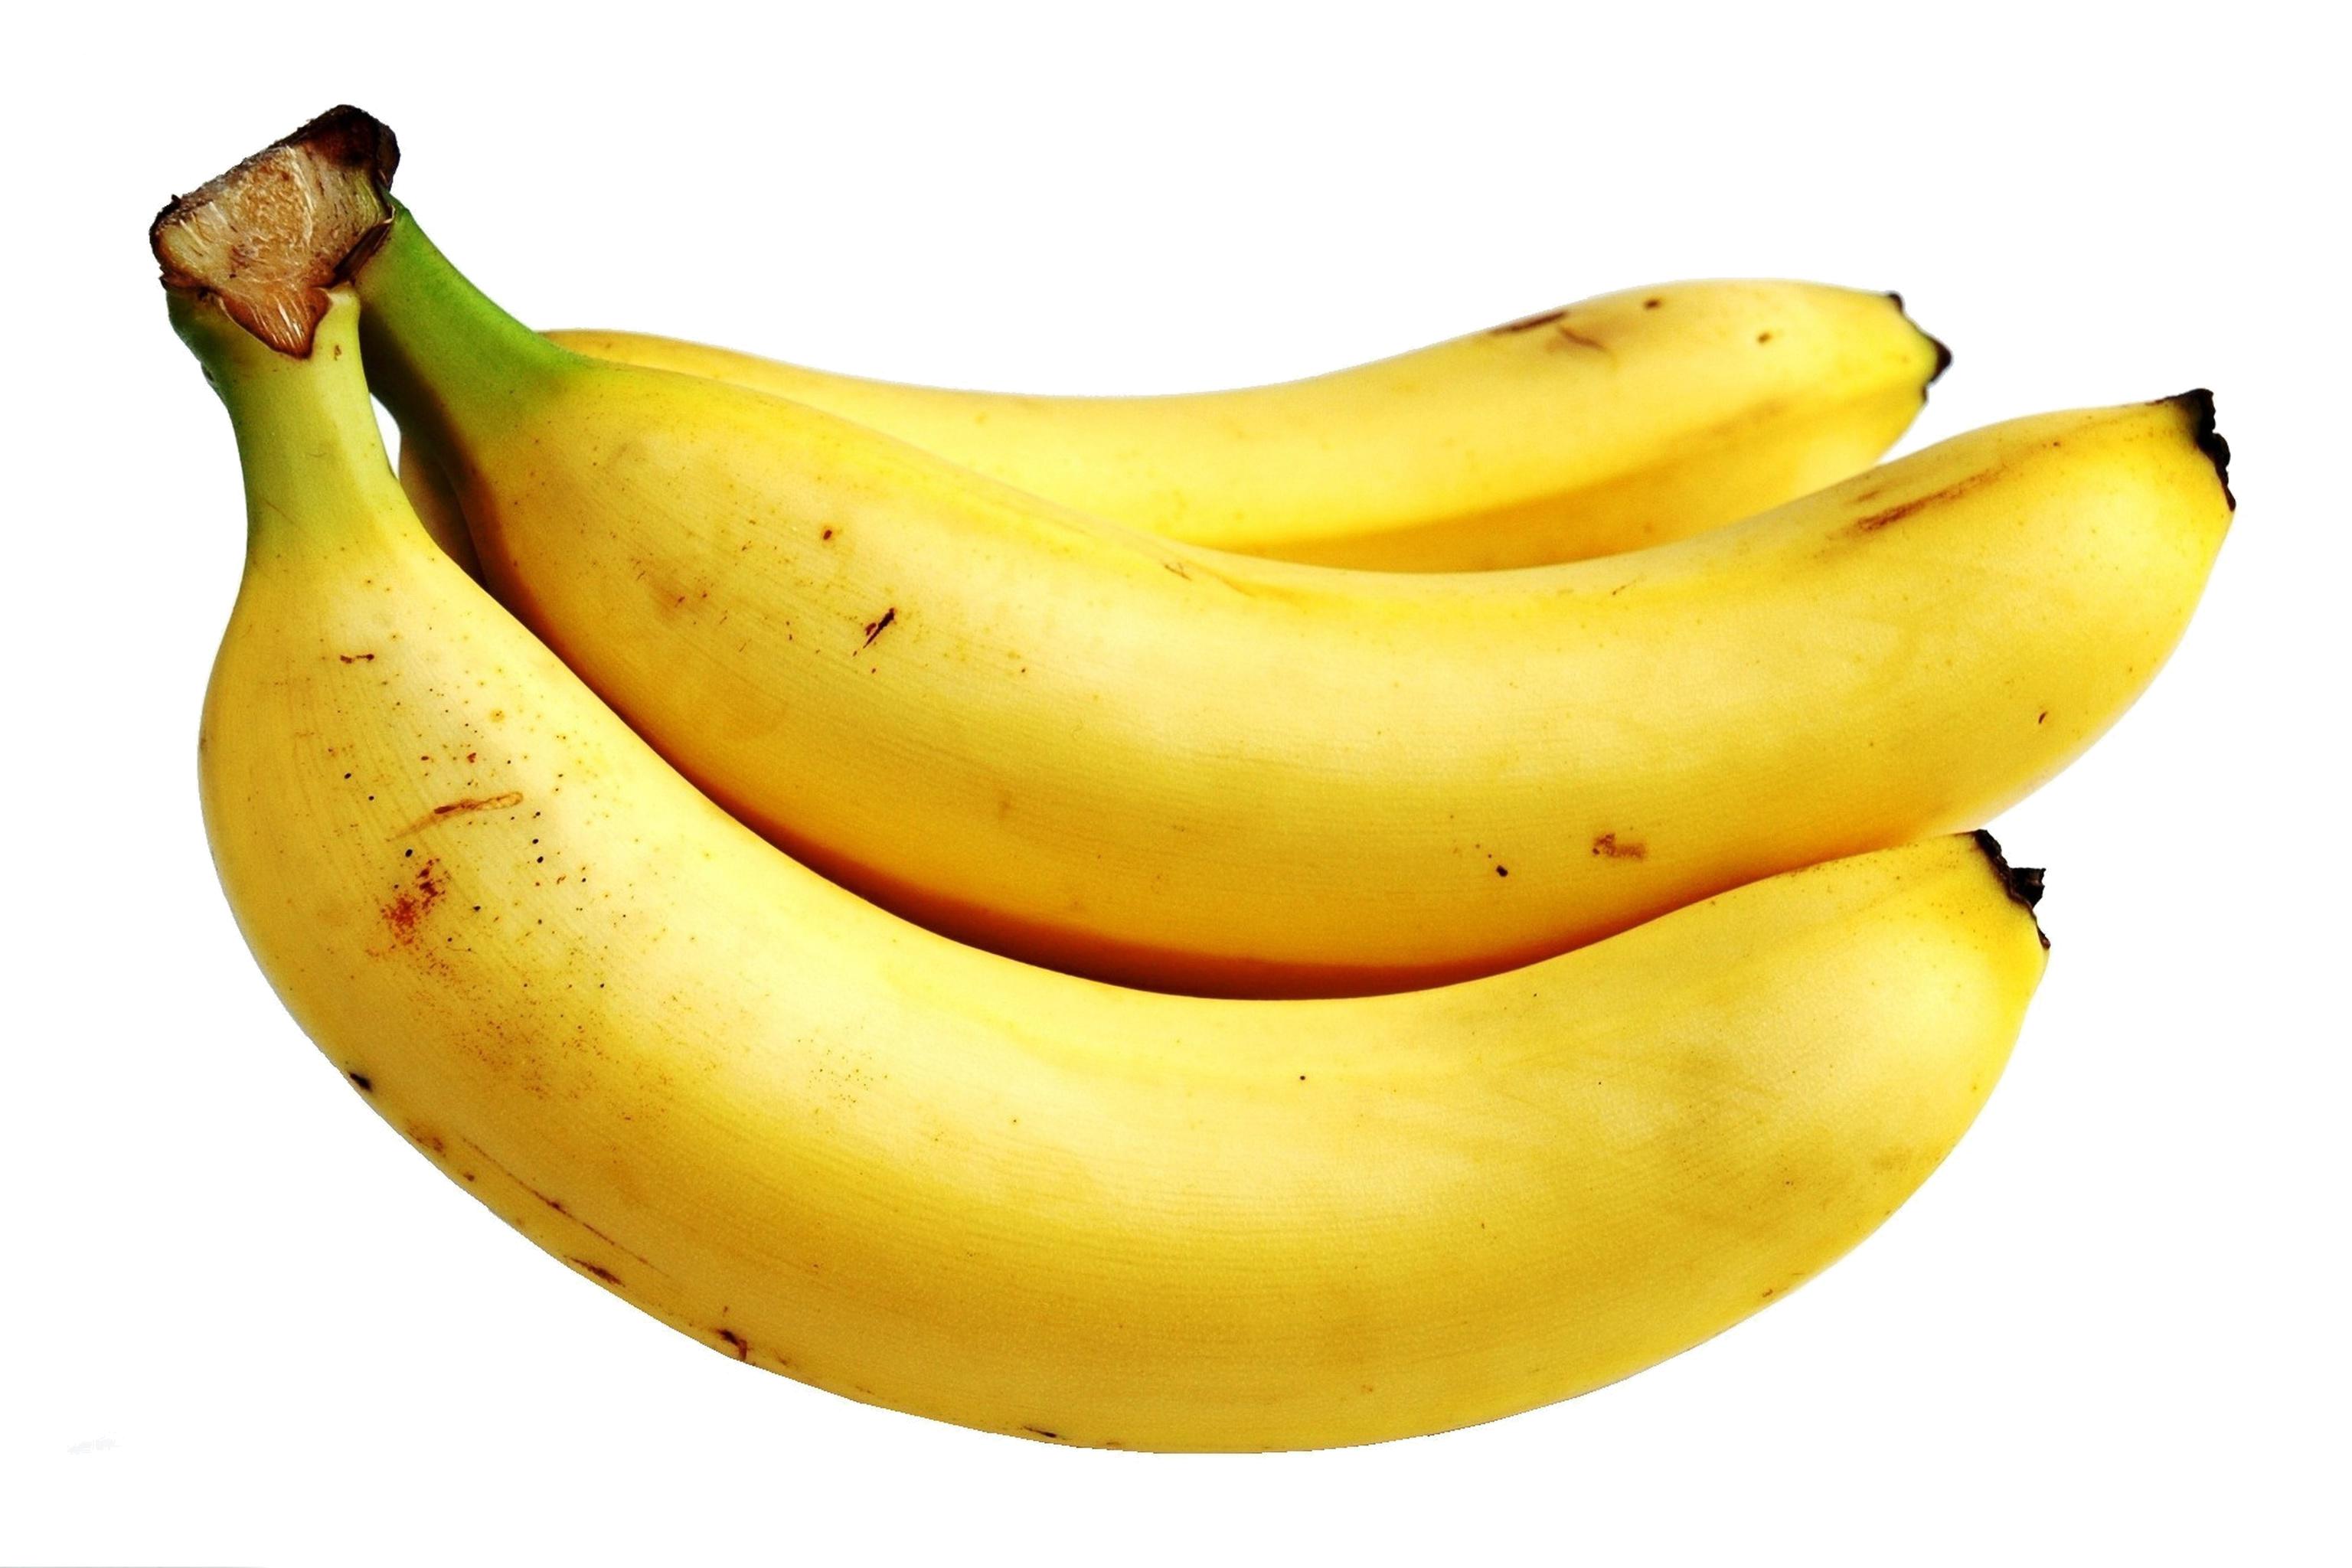 Banana PNG Images Transparent Background.